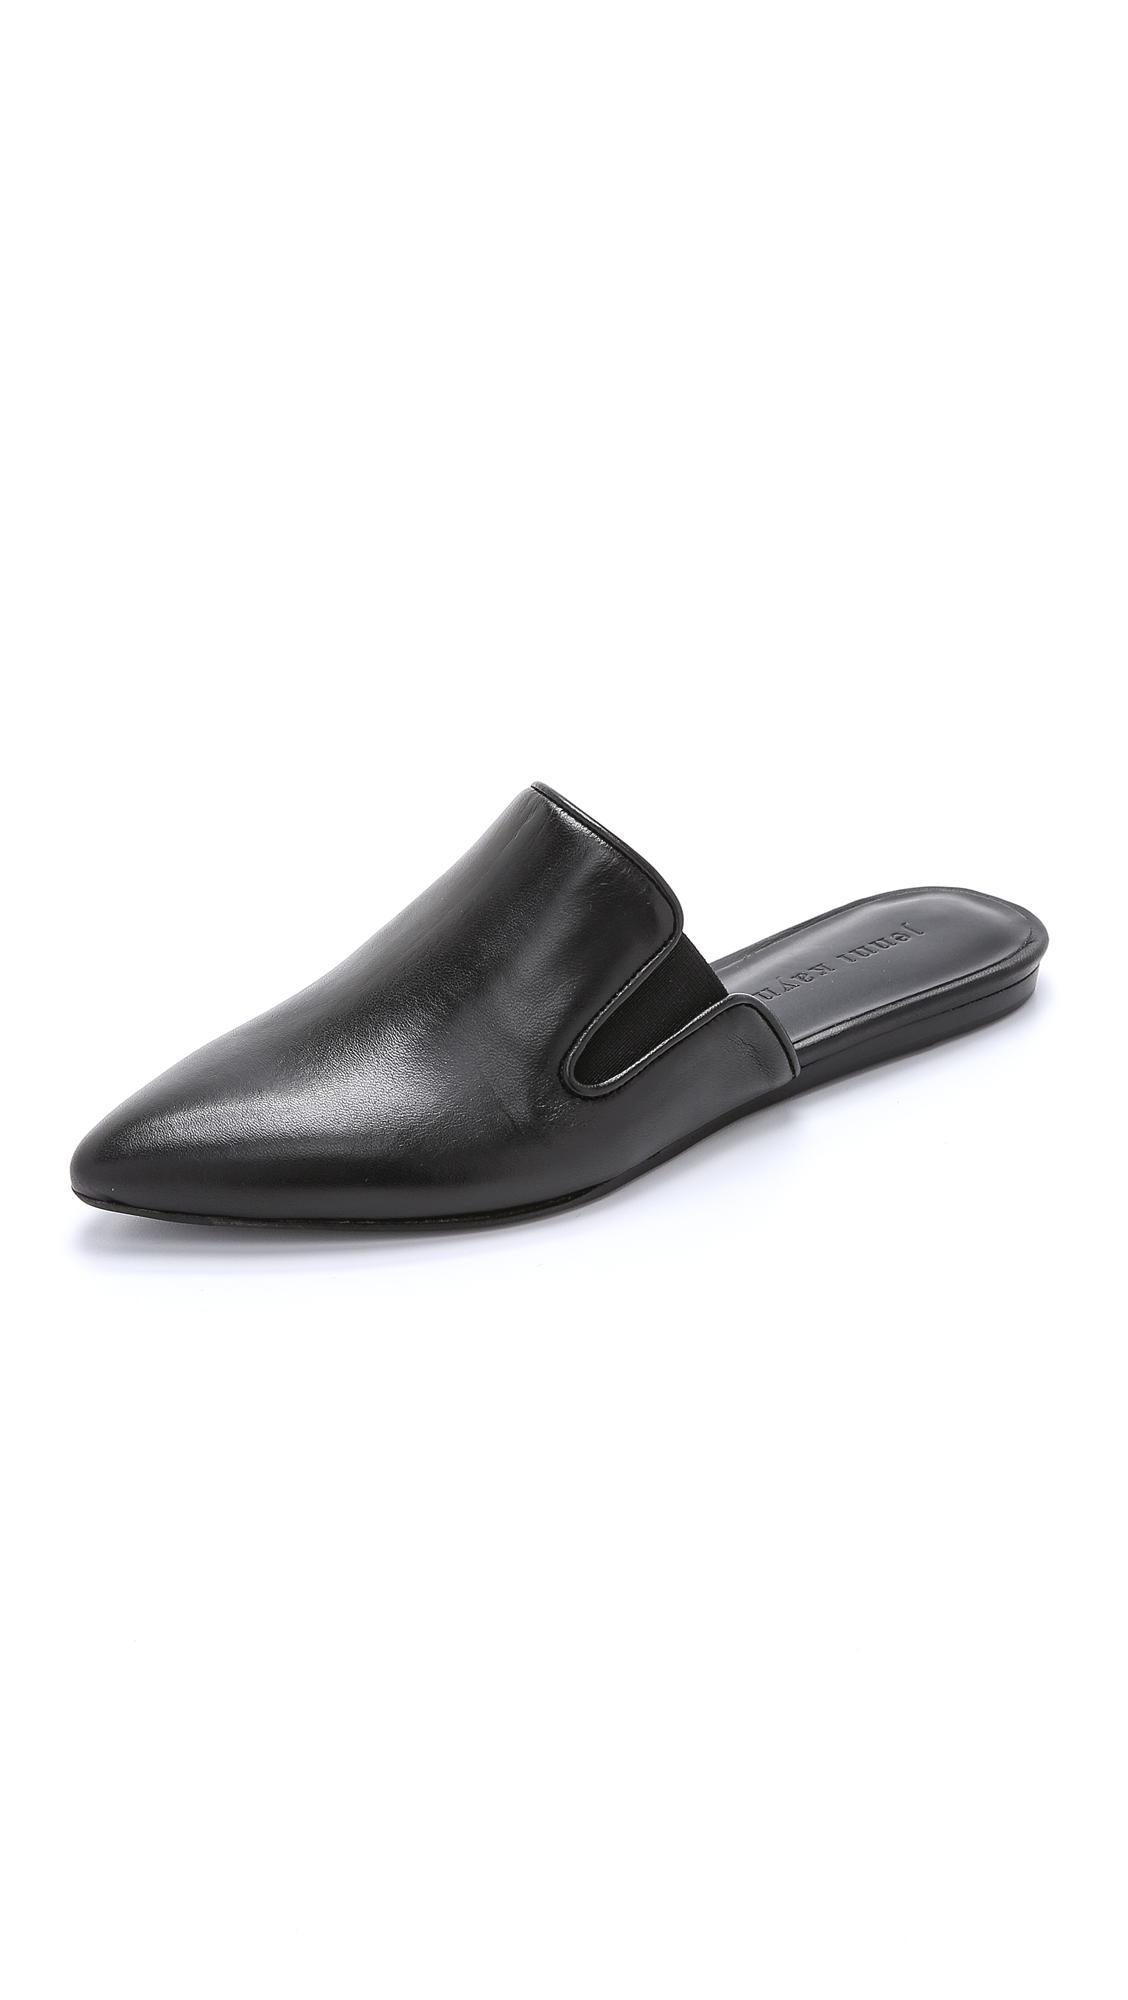 Jenni Kayne Mule Slides In Black